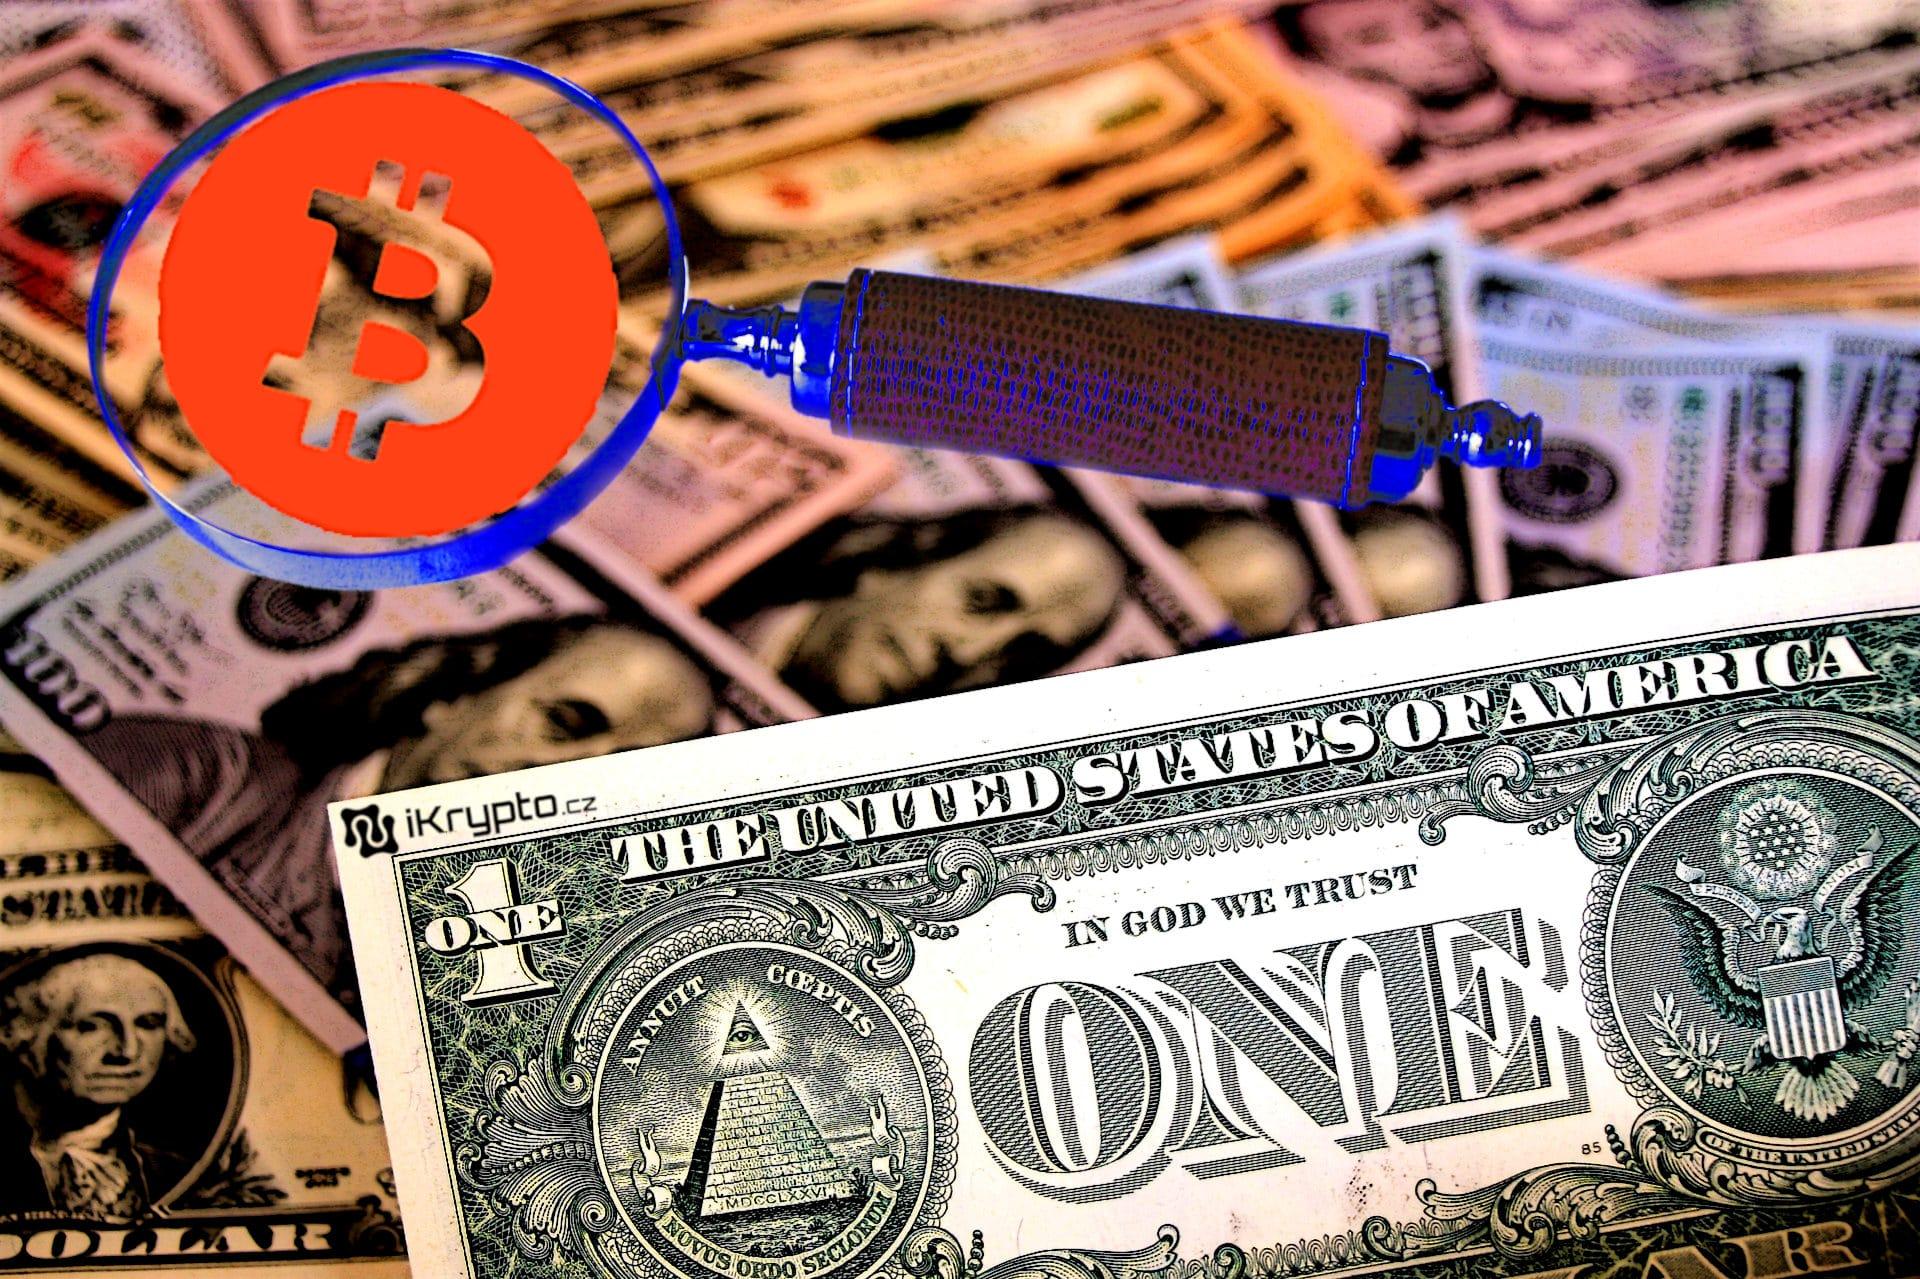 konspiracni teorie kryptomeny